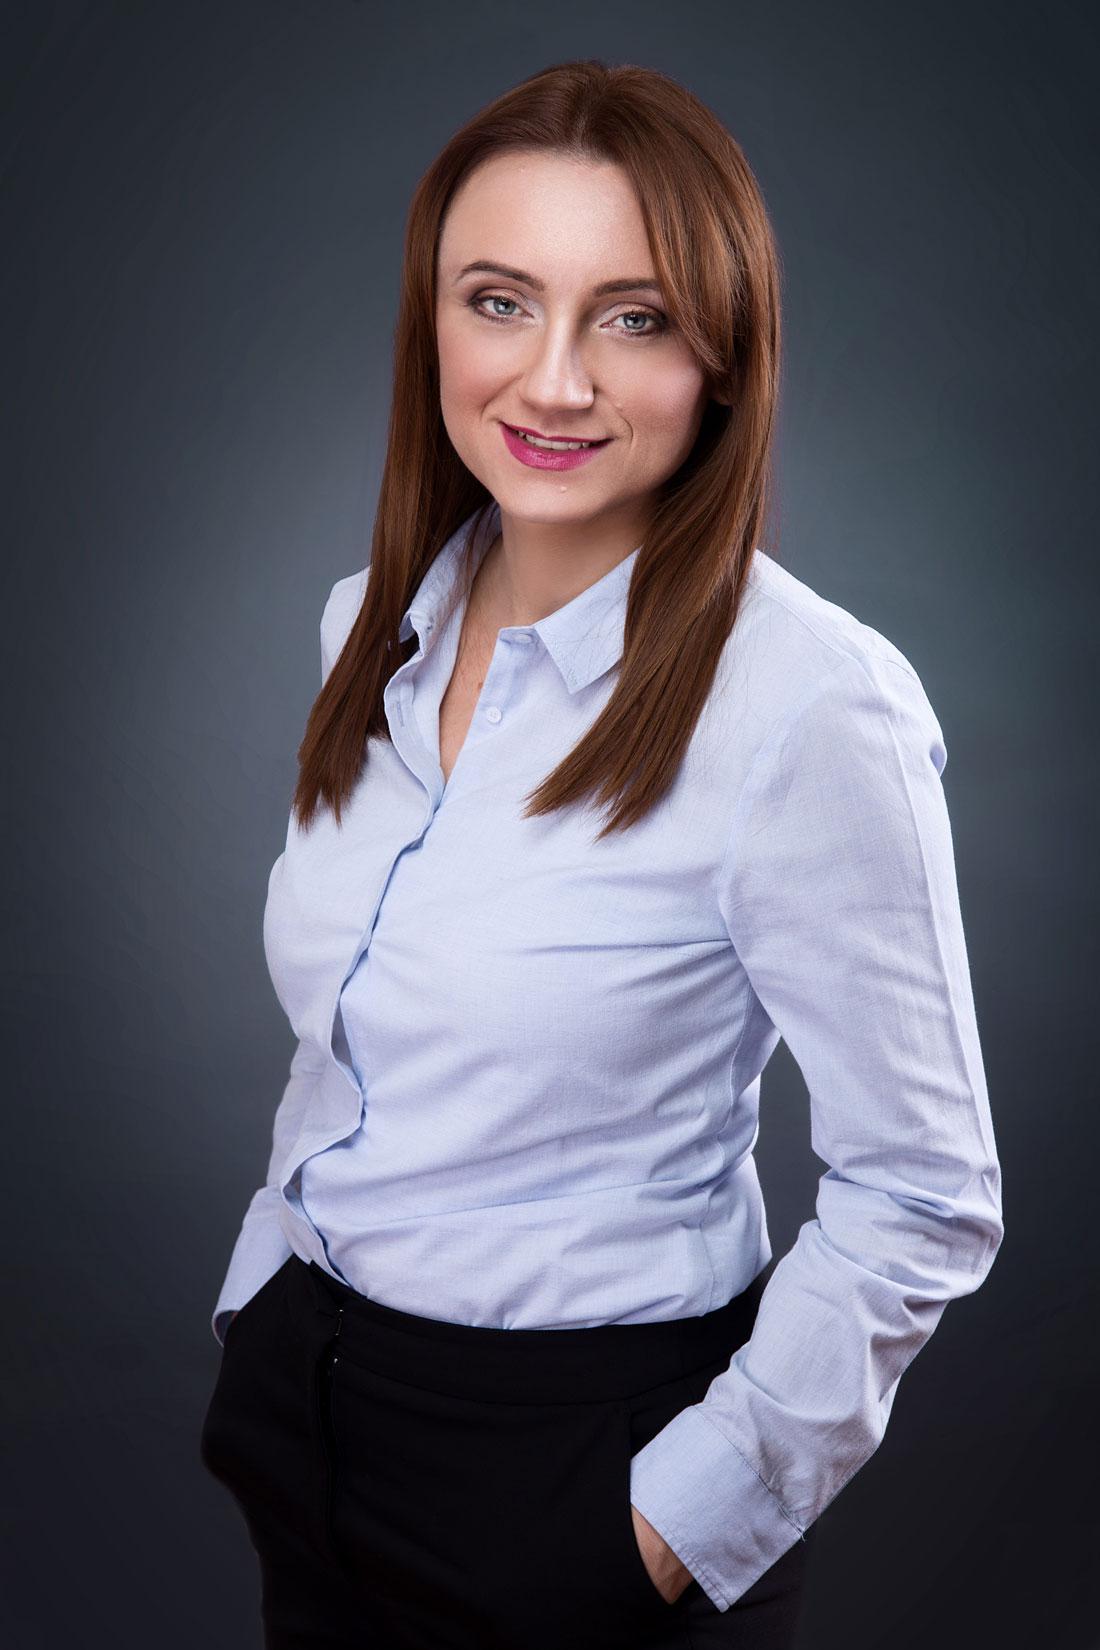 Veuve Clicquot Business Woman Award